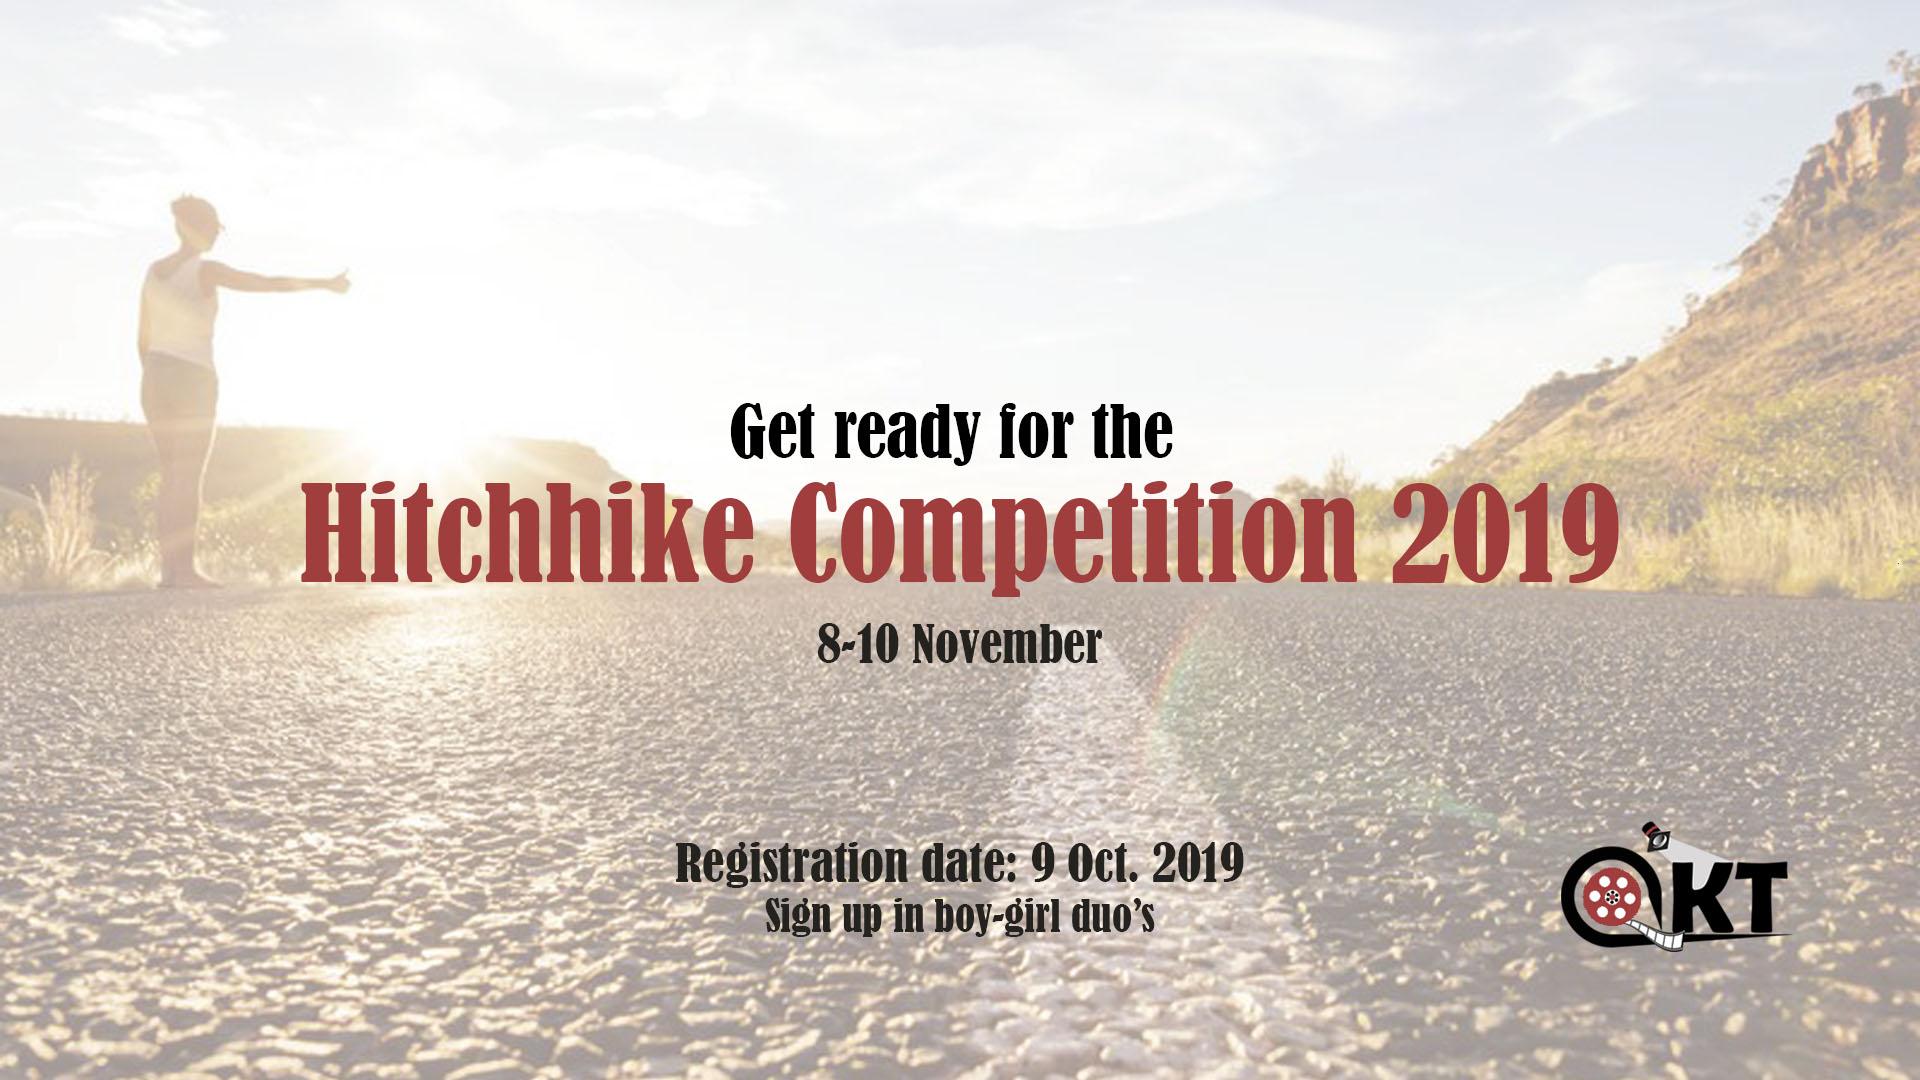 InterAKT: Hitchhike Competition!